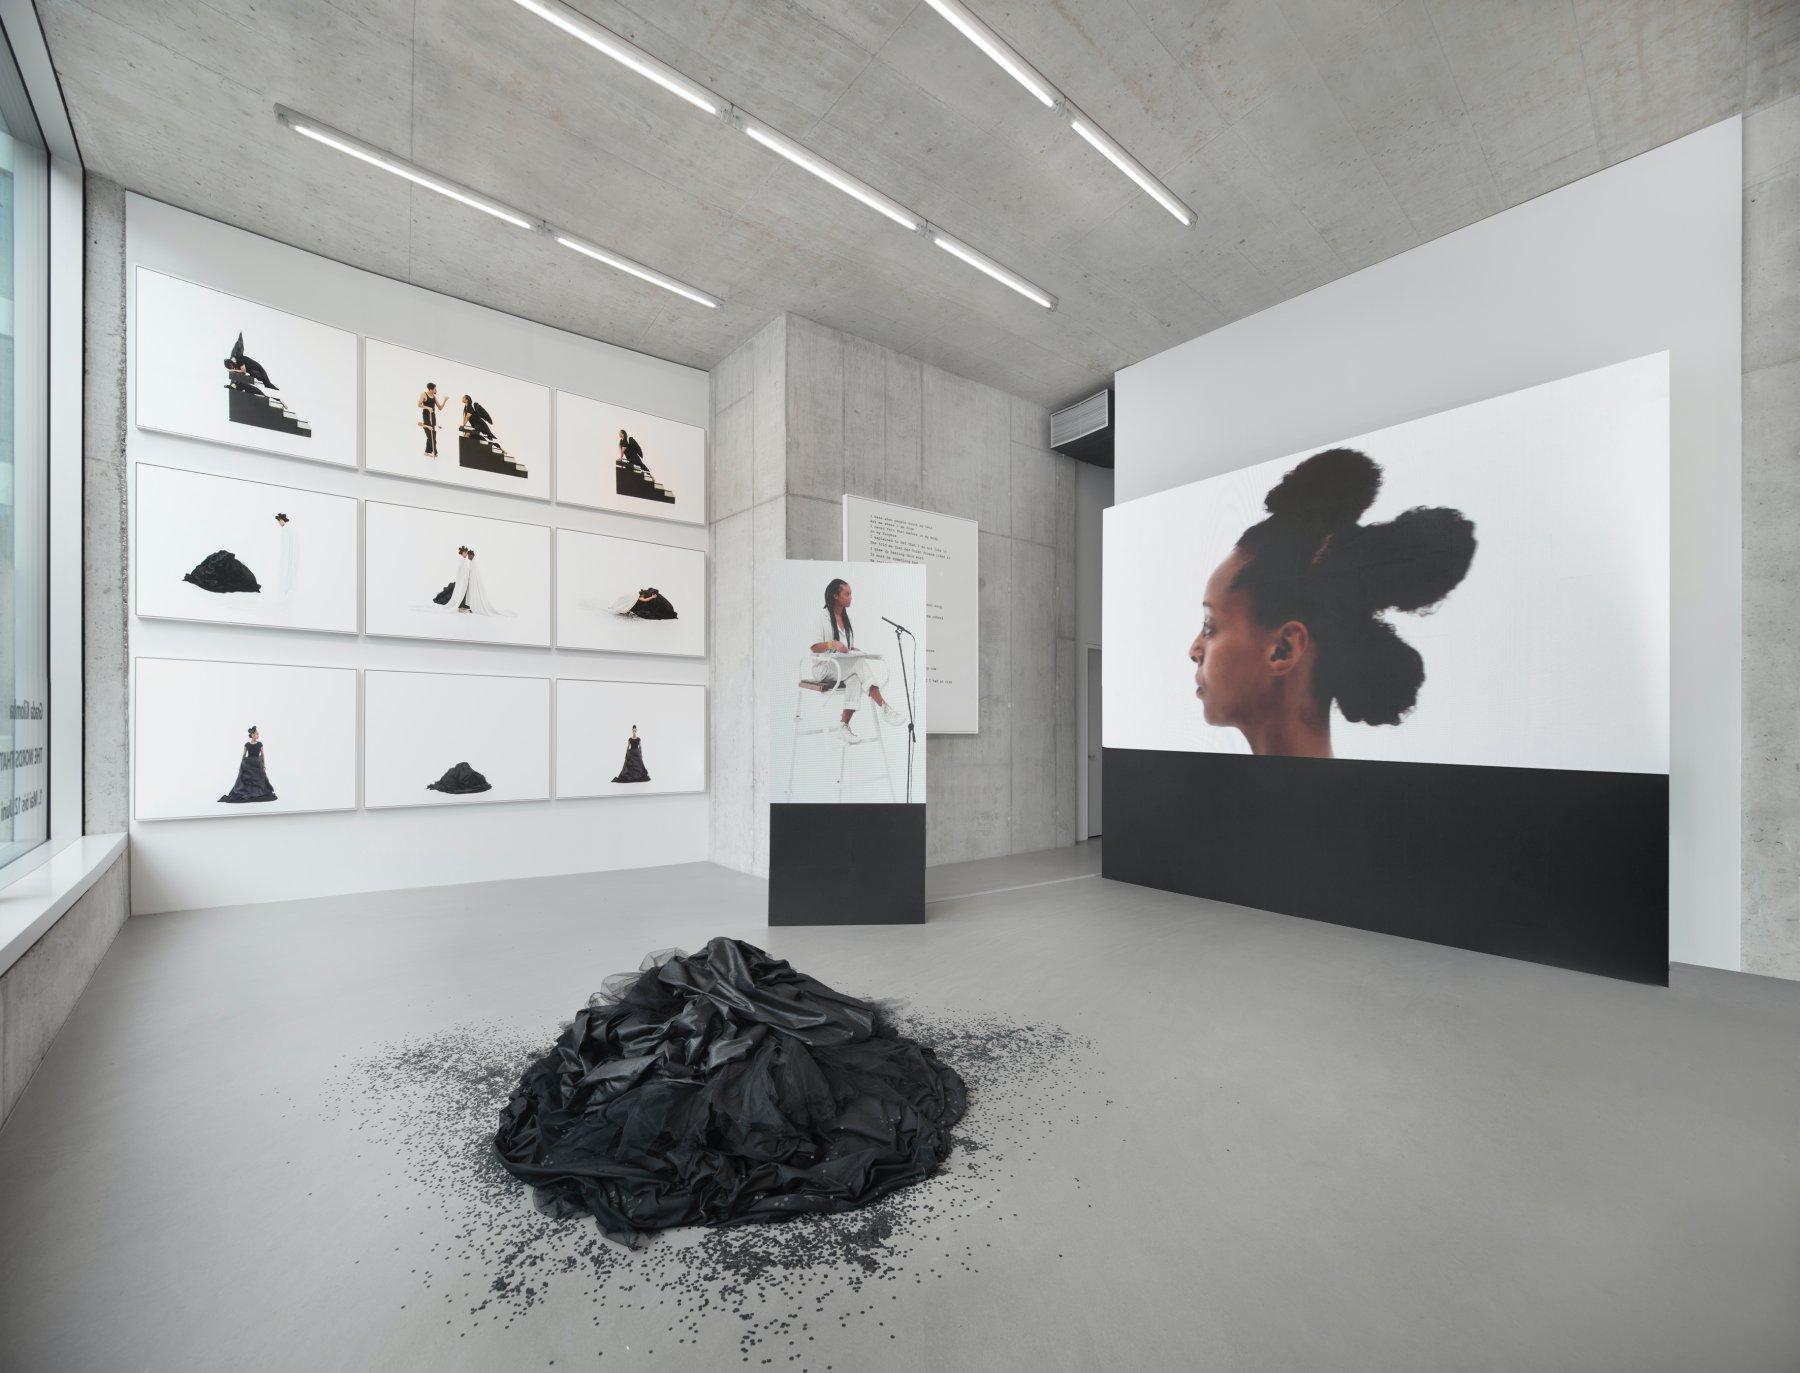 McLaughlin Gallery Grada Kilomba 1